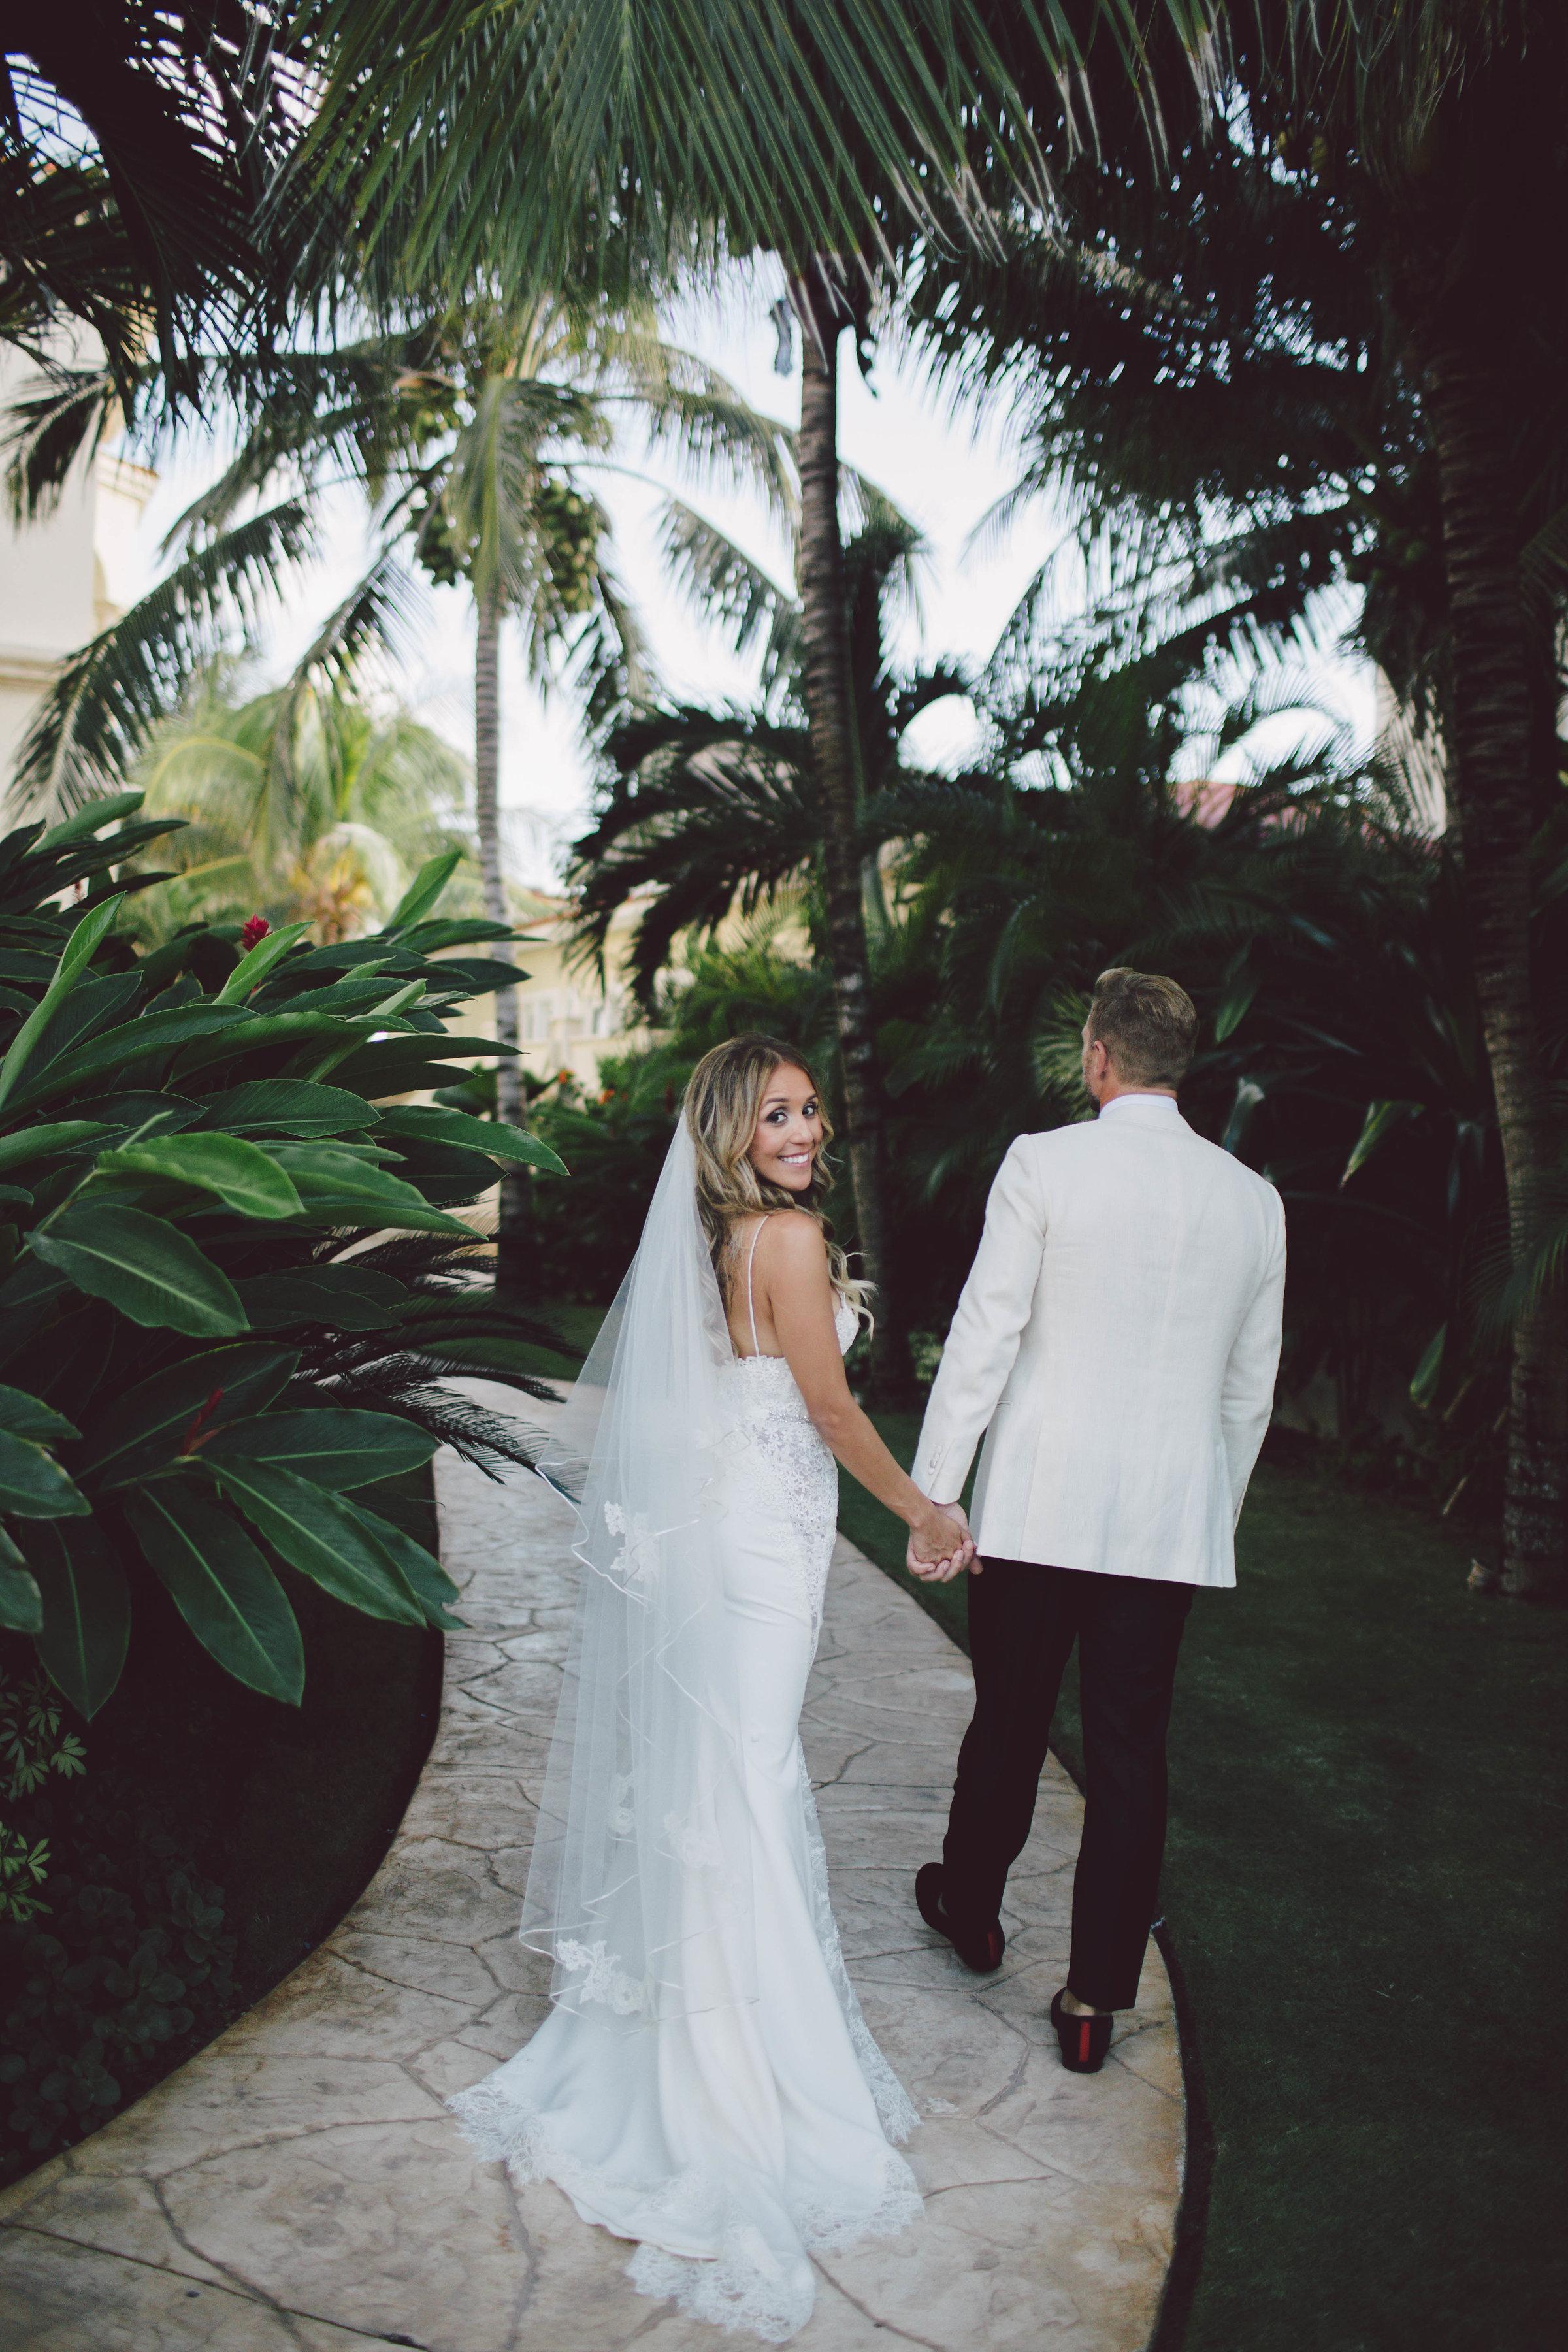 mexico_wedding_cancun_villa_la_joya_evangeline_lane_097.jpg